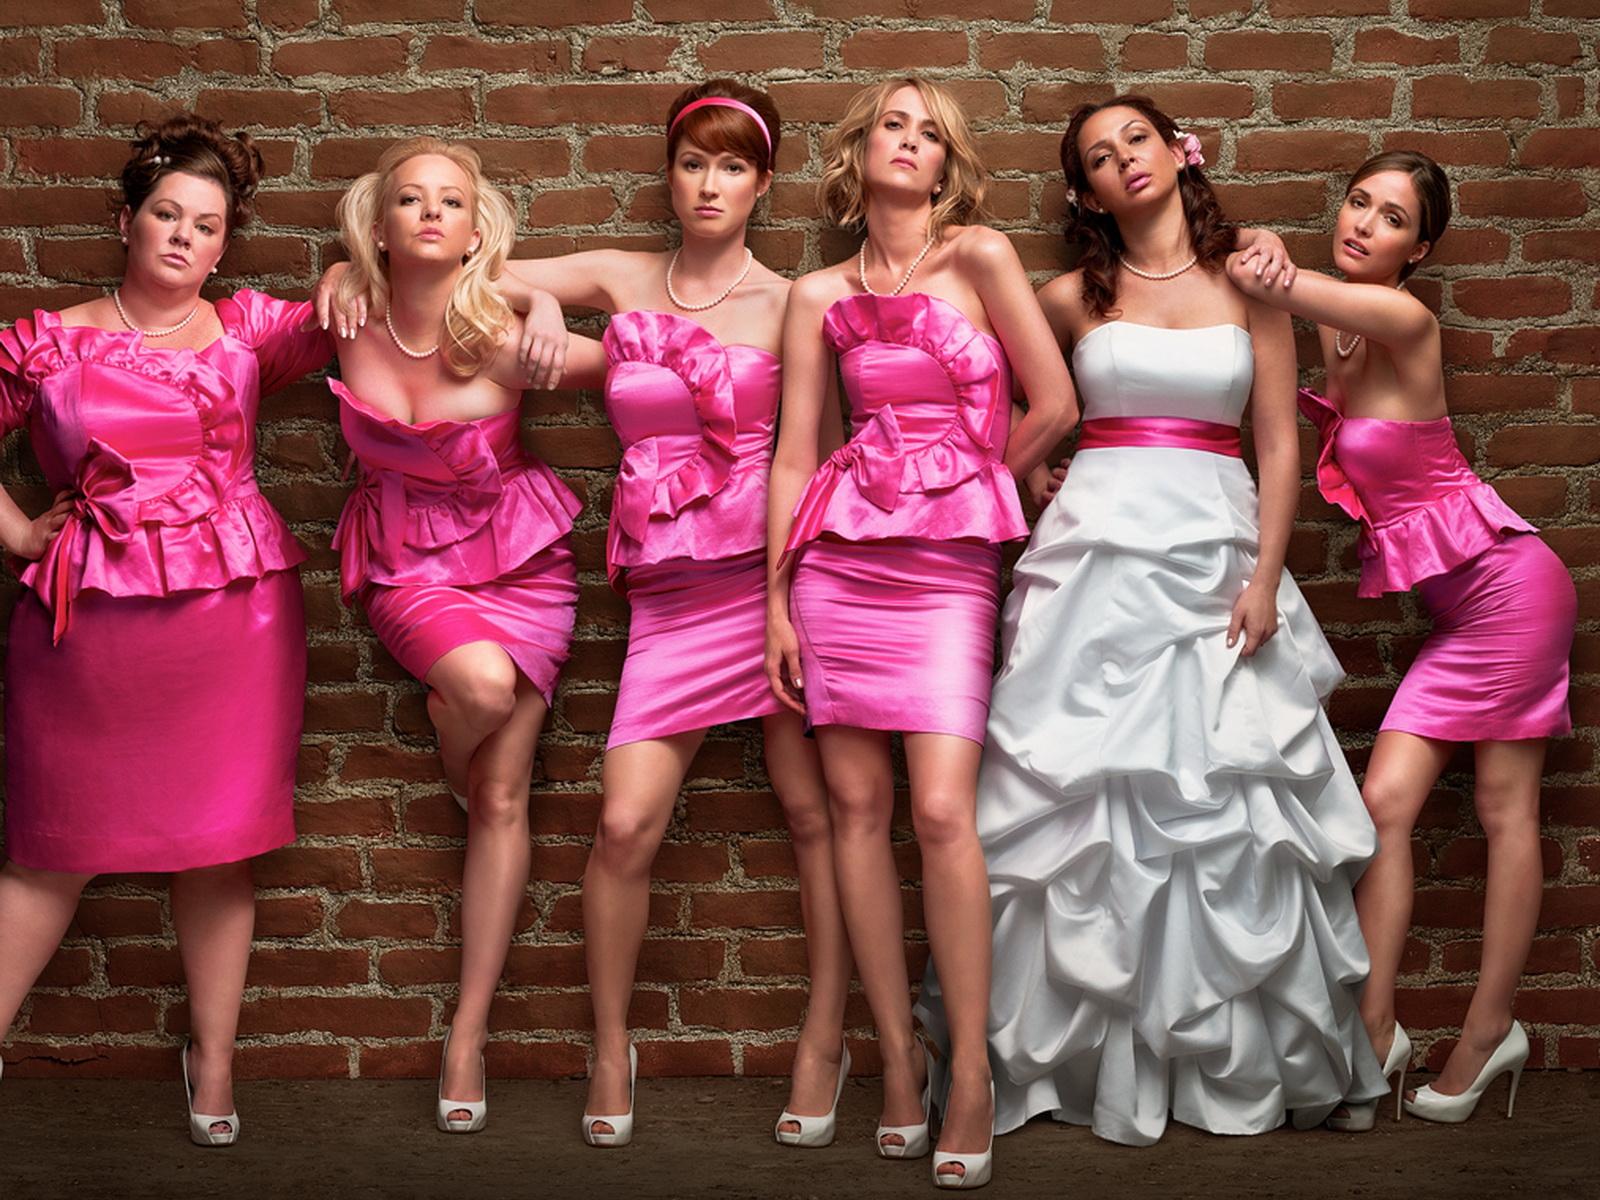 Confessions of a Bridesmaid